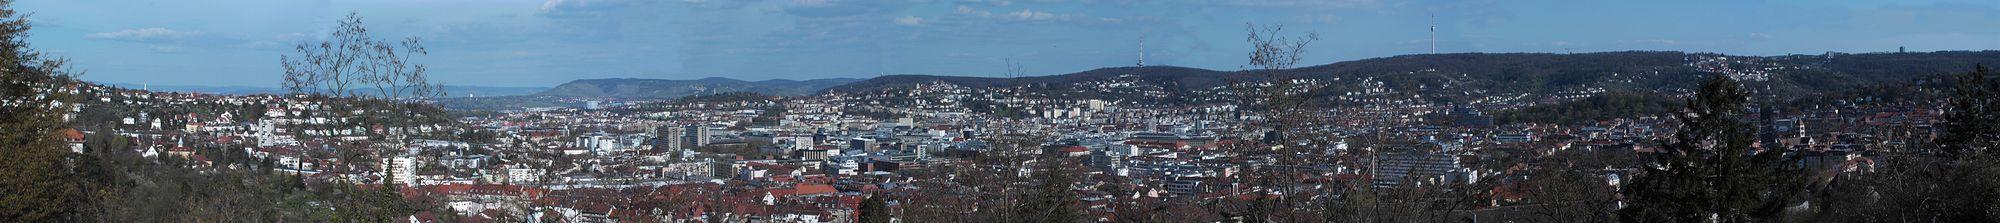 Stuttgart Panorama 2007